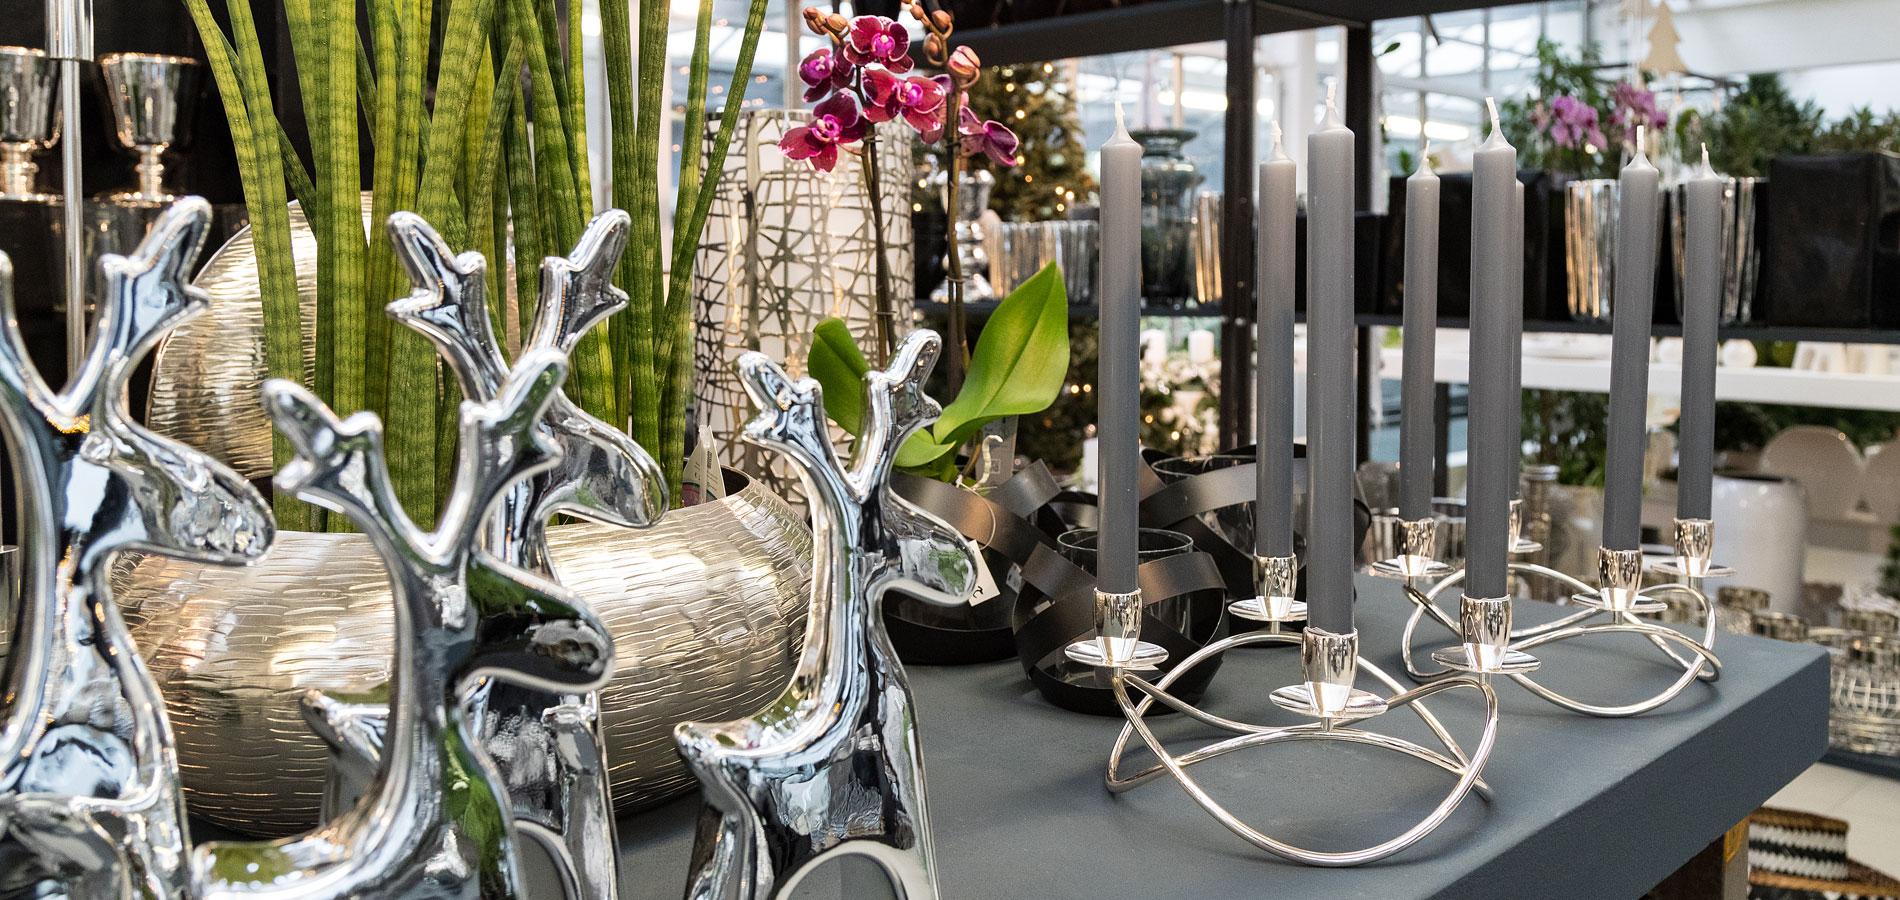 gartenhof k sters gmbh floristische ideen zum advent. Black Bedroom Furniture Sets. Home Design Ideas